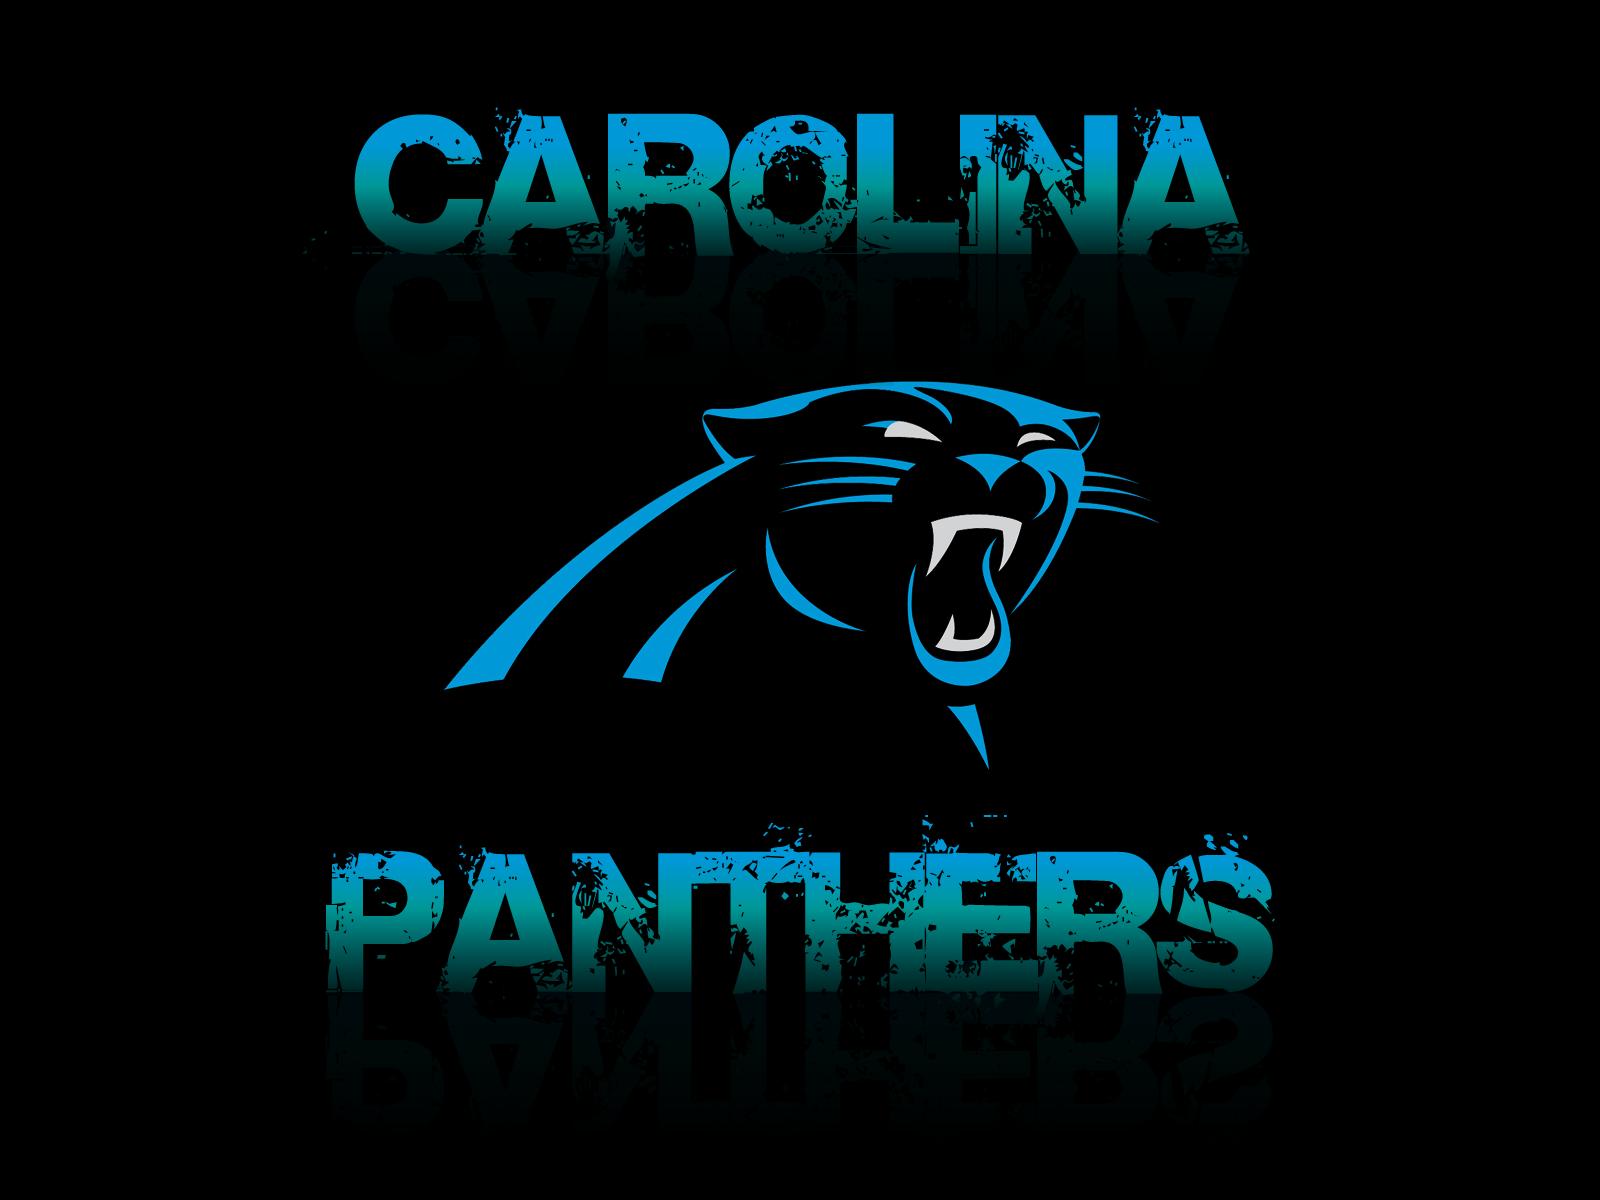 Carolina Panthers New Logo Wallpaper Good Iphone Wallpaper Of The New Logo Carolina Panthers Wallpaper Carolina Panthers Logo Carolina Panthers Football